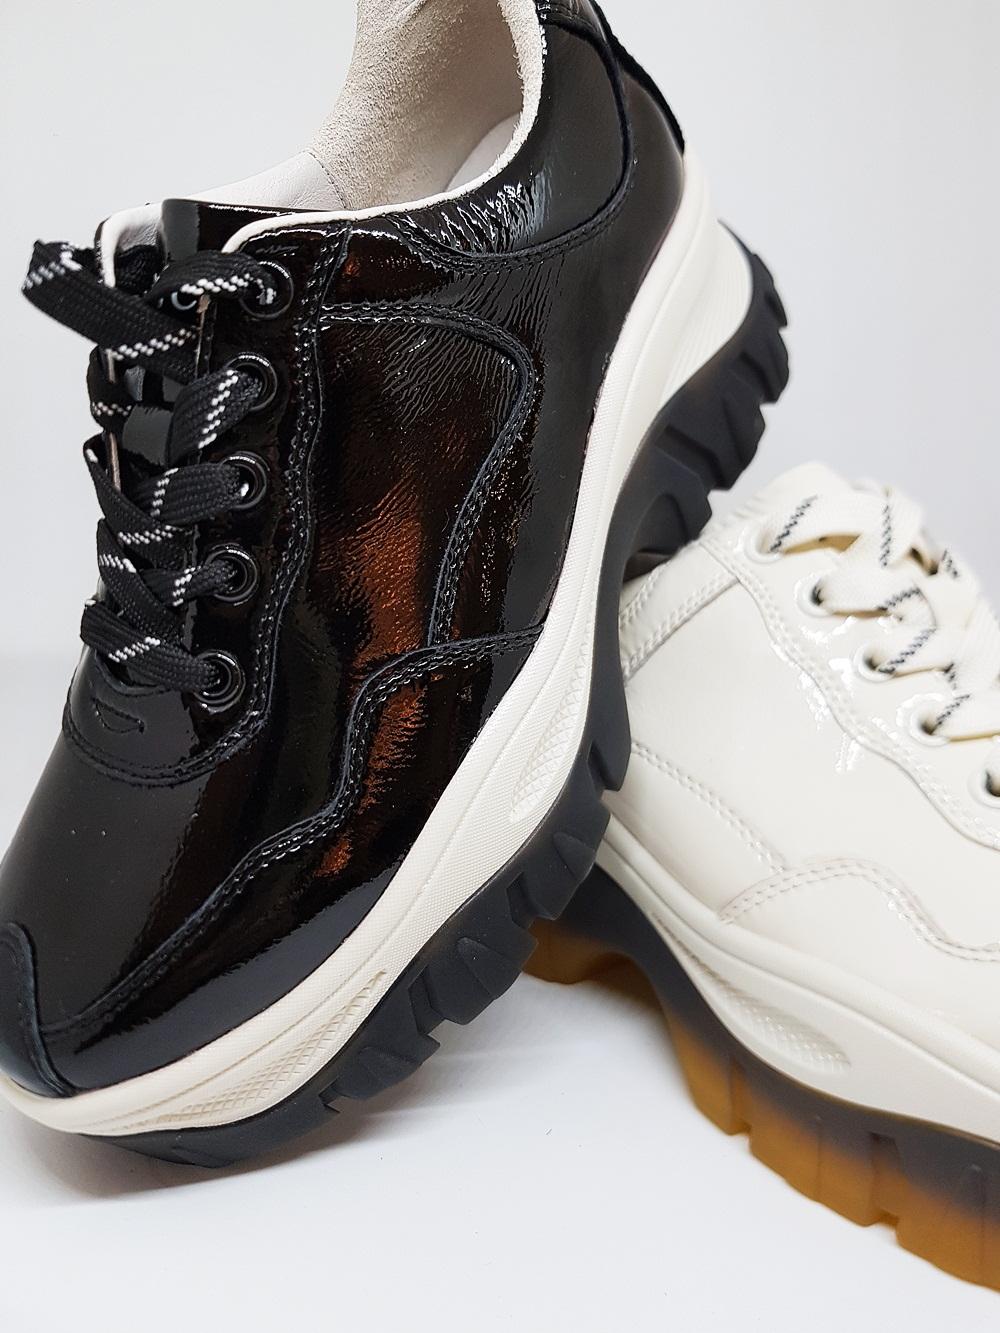 Novedad Sneakers piel charol